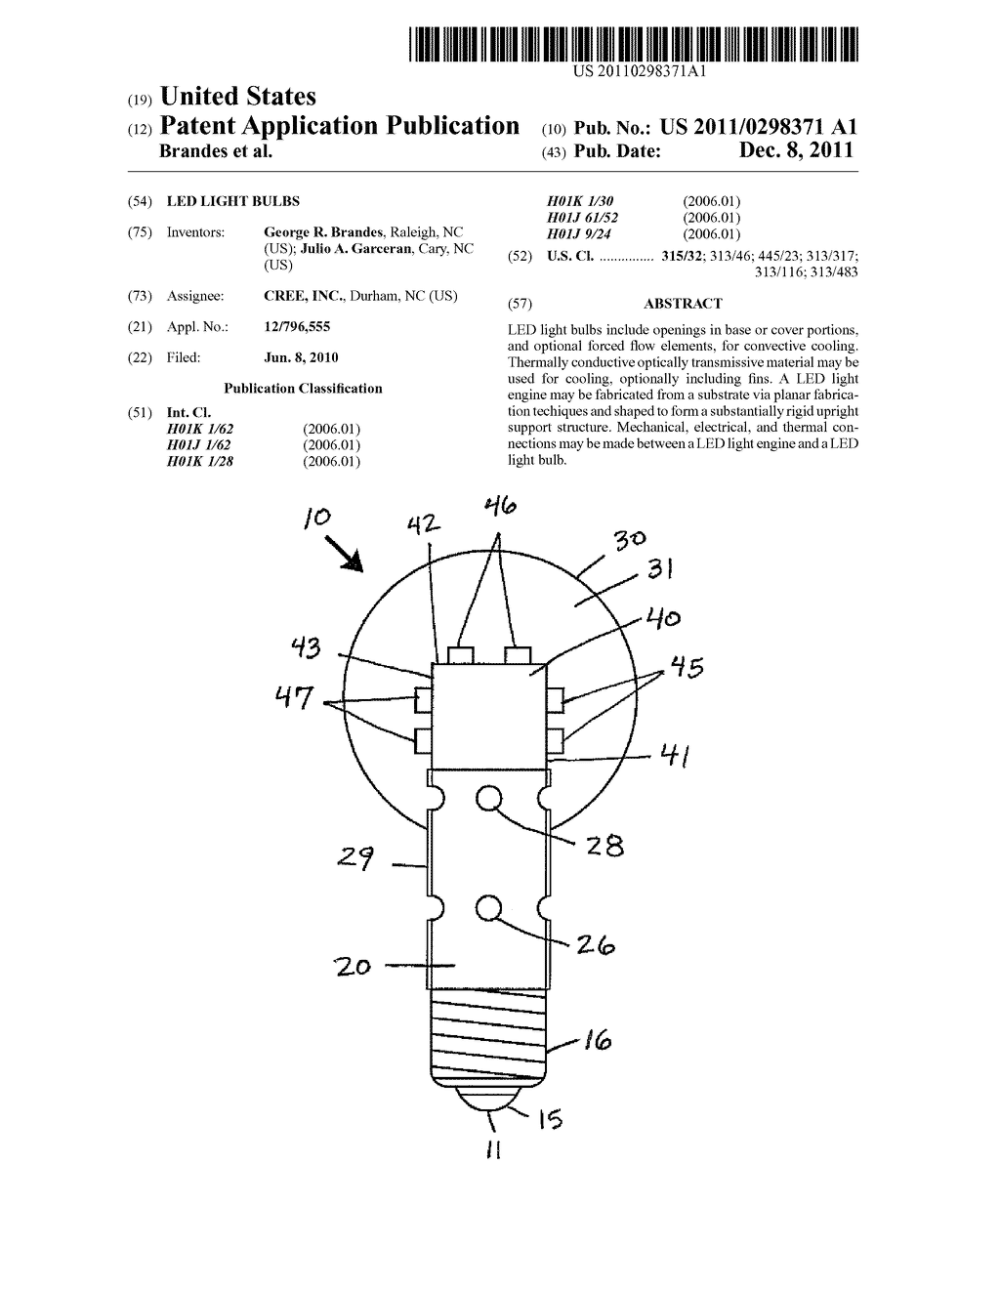 medium resolution of led light bulbs diagram schematic and image 01 diagram of led light bulb